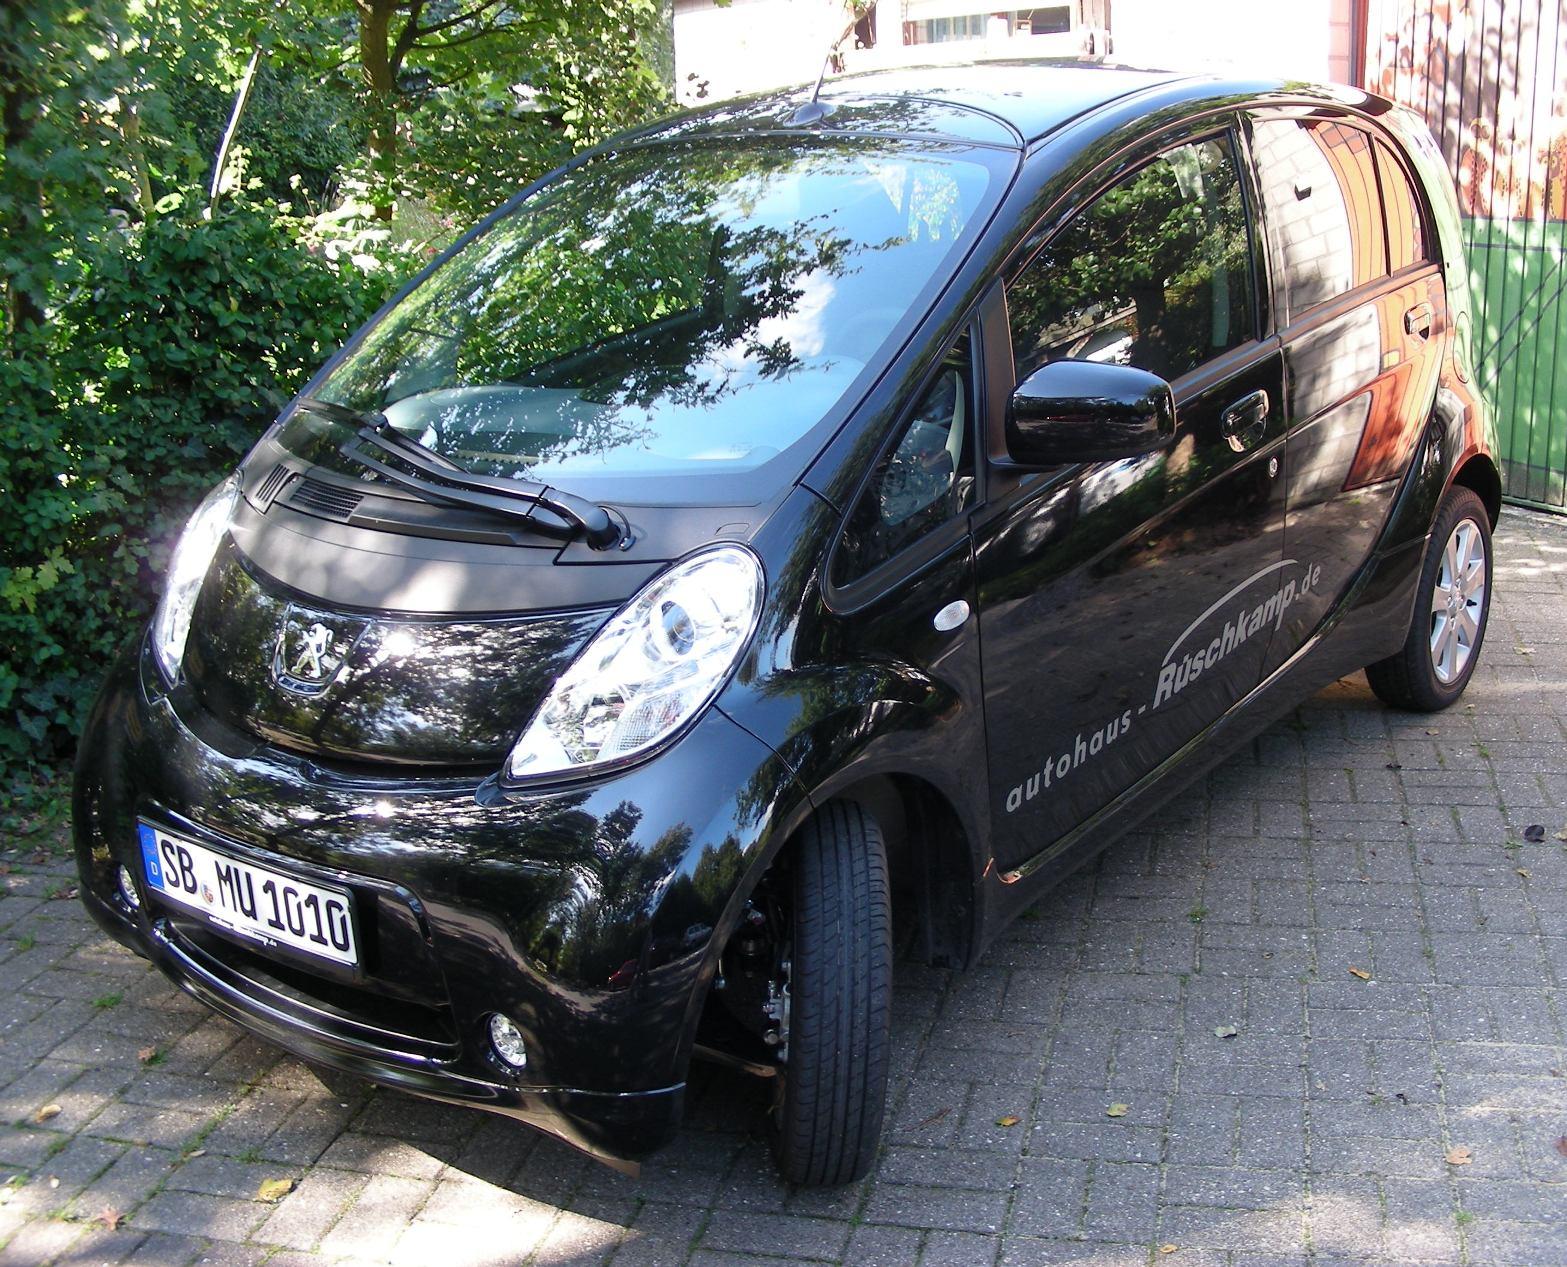 Peugeot Leasing-Fahrzeug vom Autohaus Rüschkamp